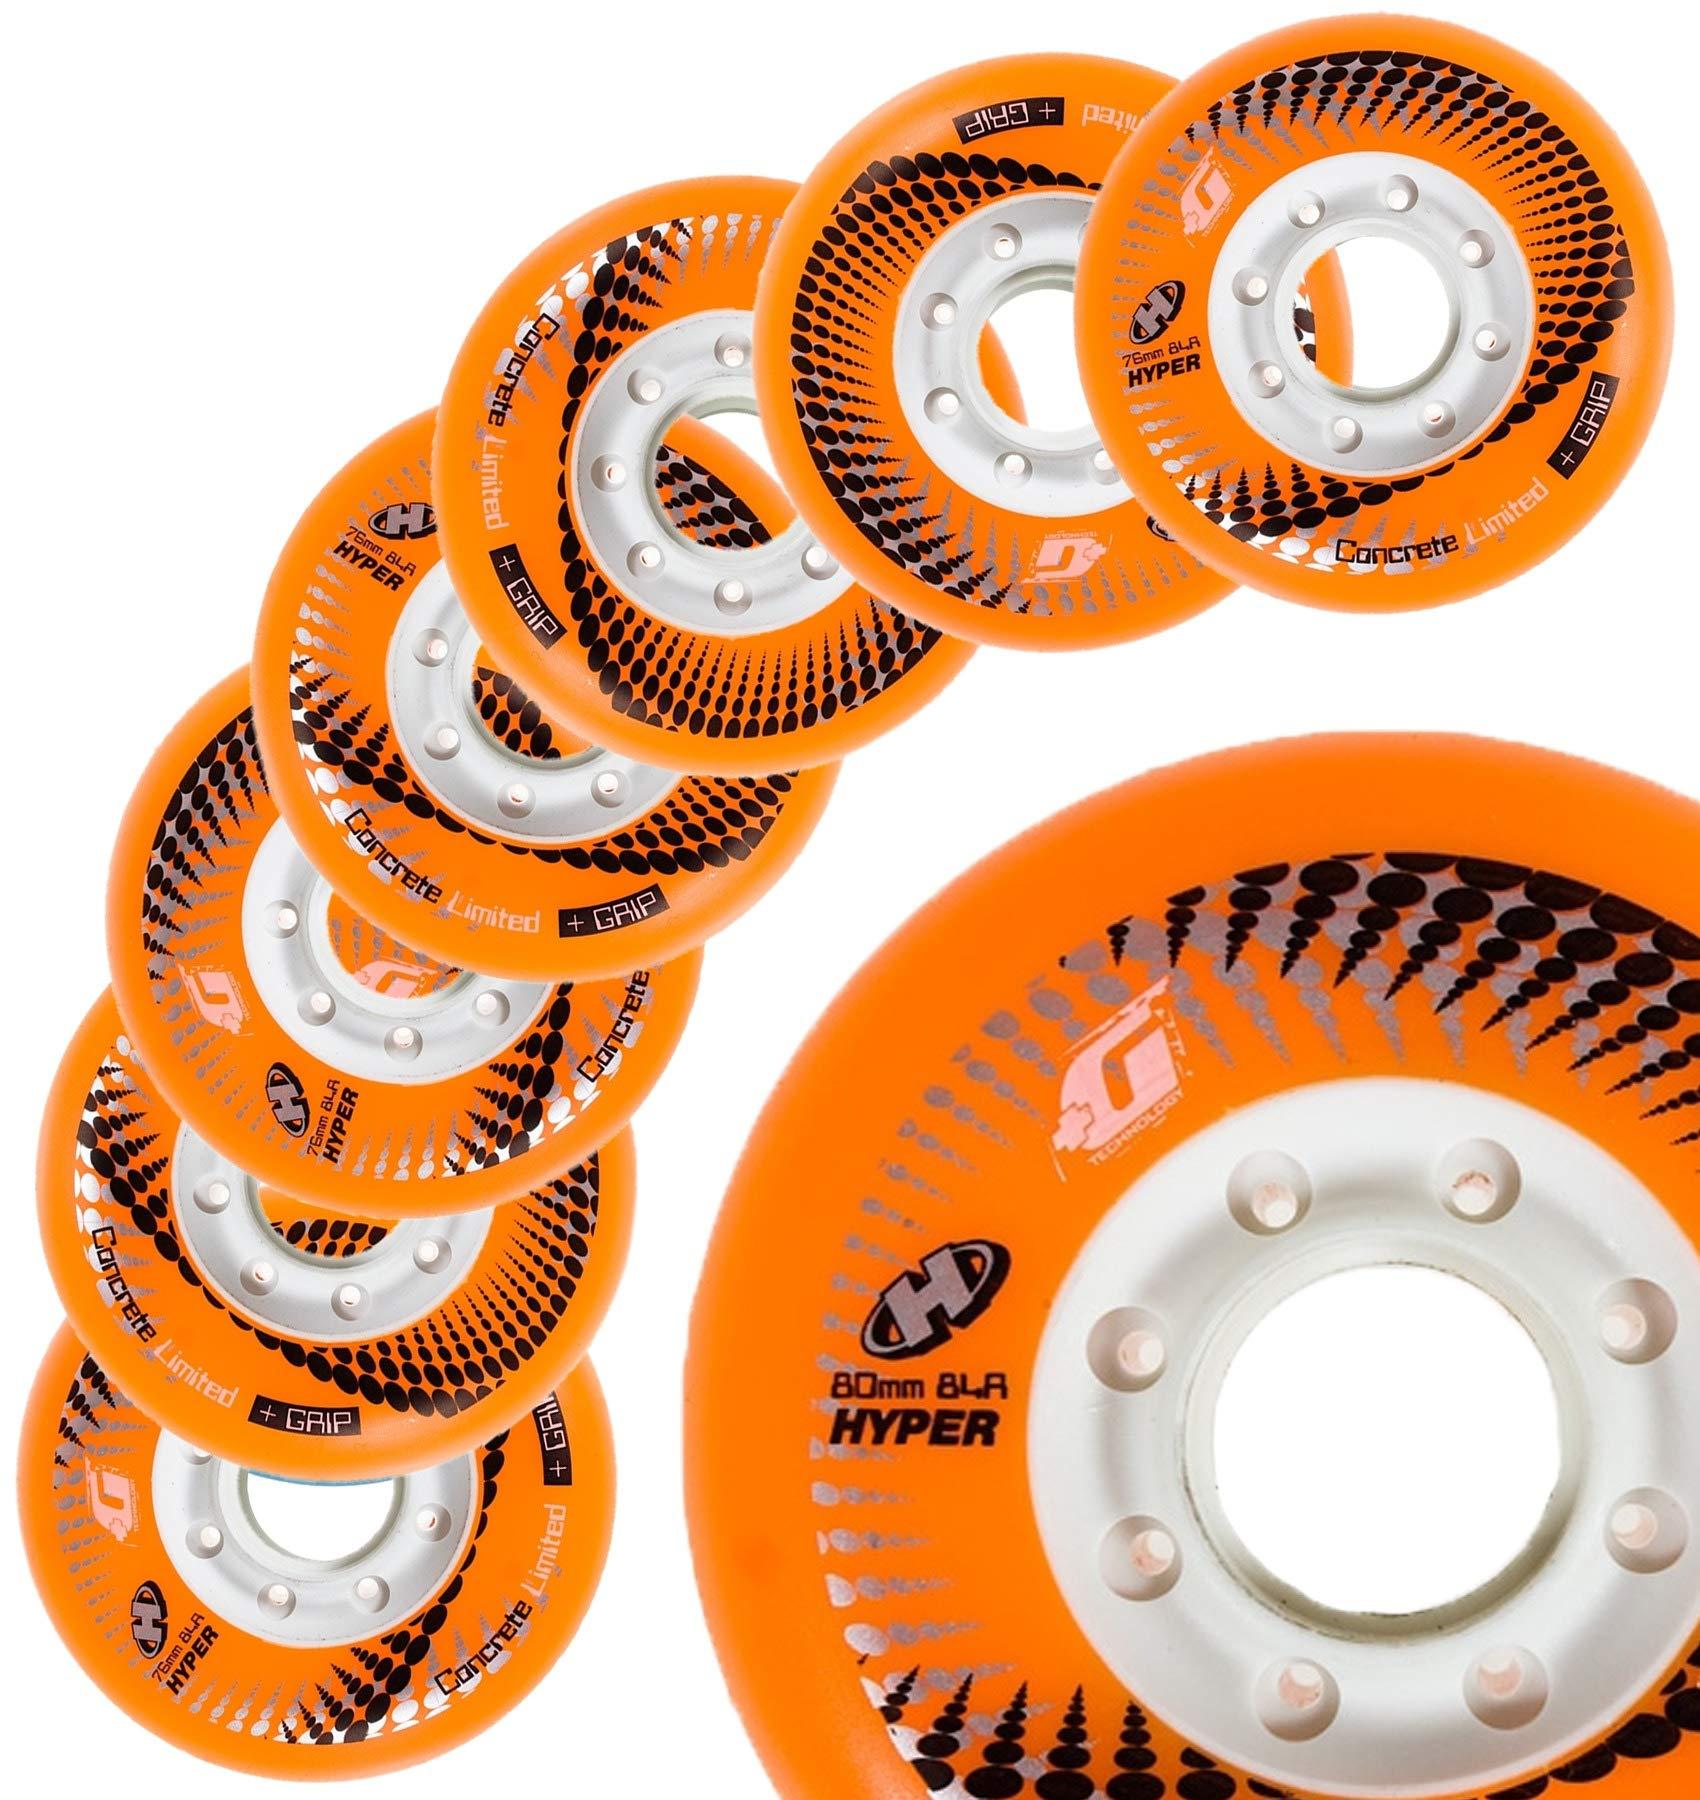 Inline Skate Wheels Hyper Concrete +G - 8 Wheels - 84A - Sizes: 72MM, 76MM, 80MM - Freeride, Slalom, Fitness, Urban - Colors: White, Black, Orange, Green, Cyan, Red (Orange, 80MM) by Hyper Wheels